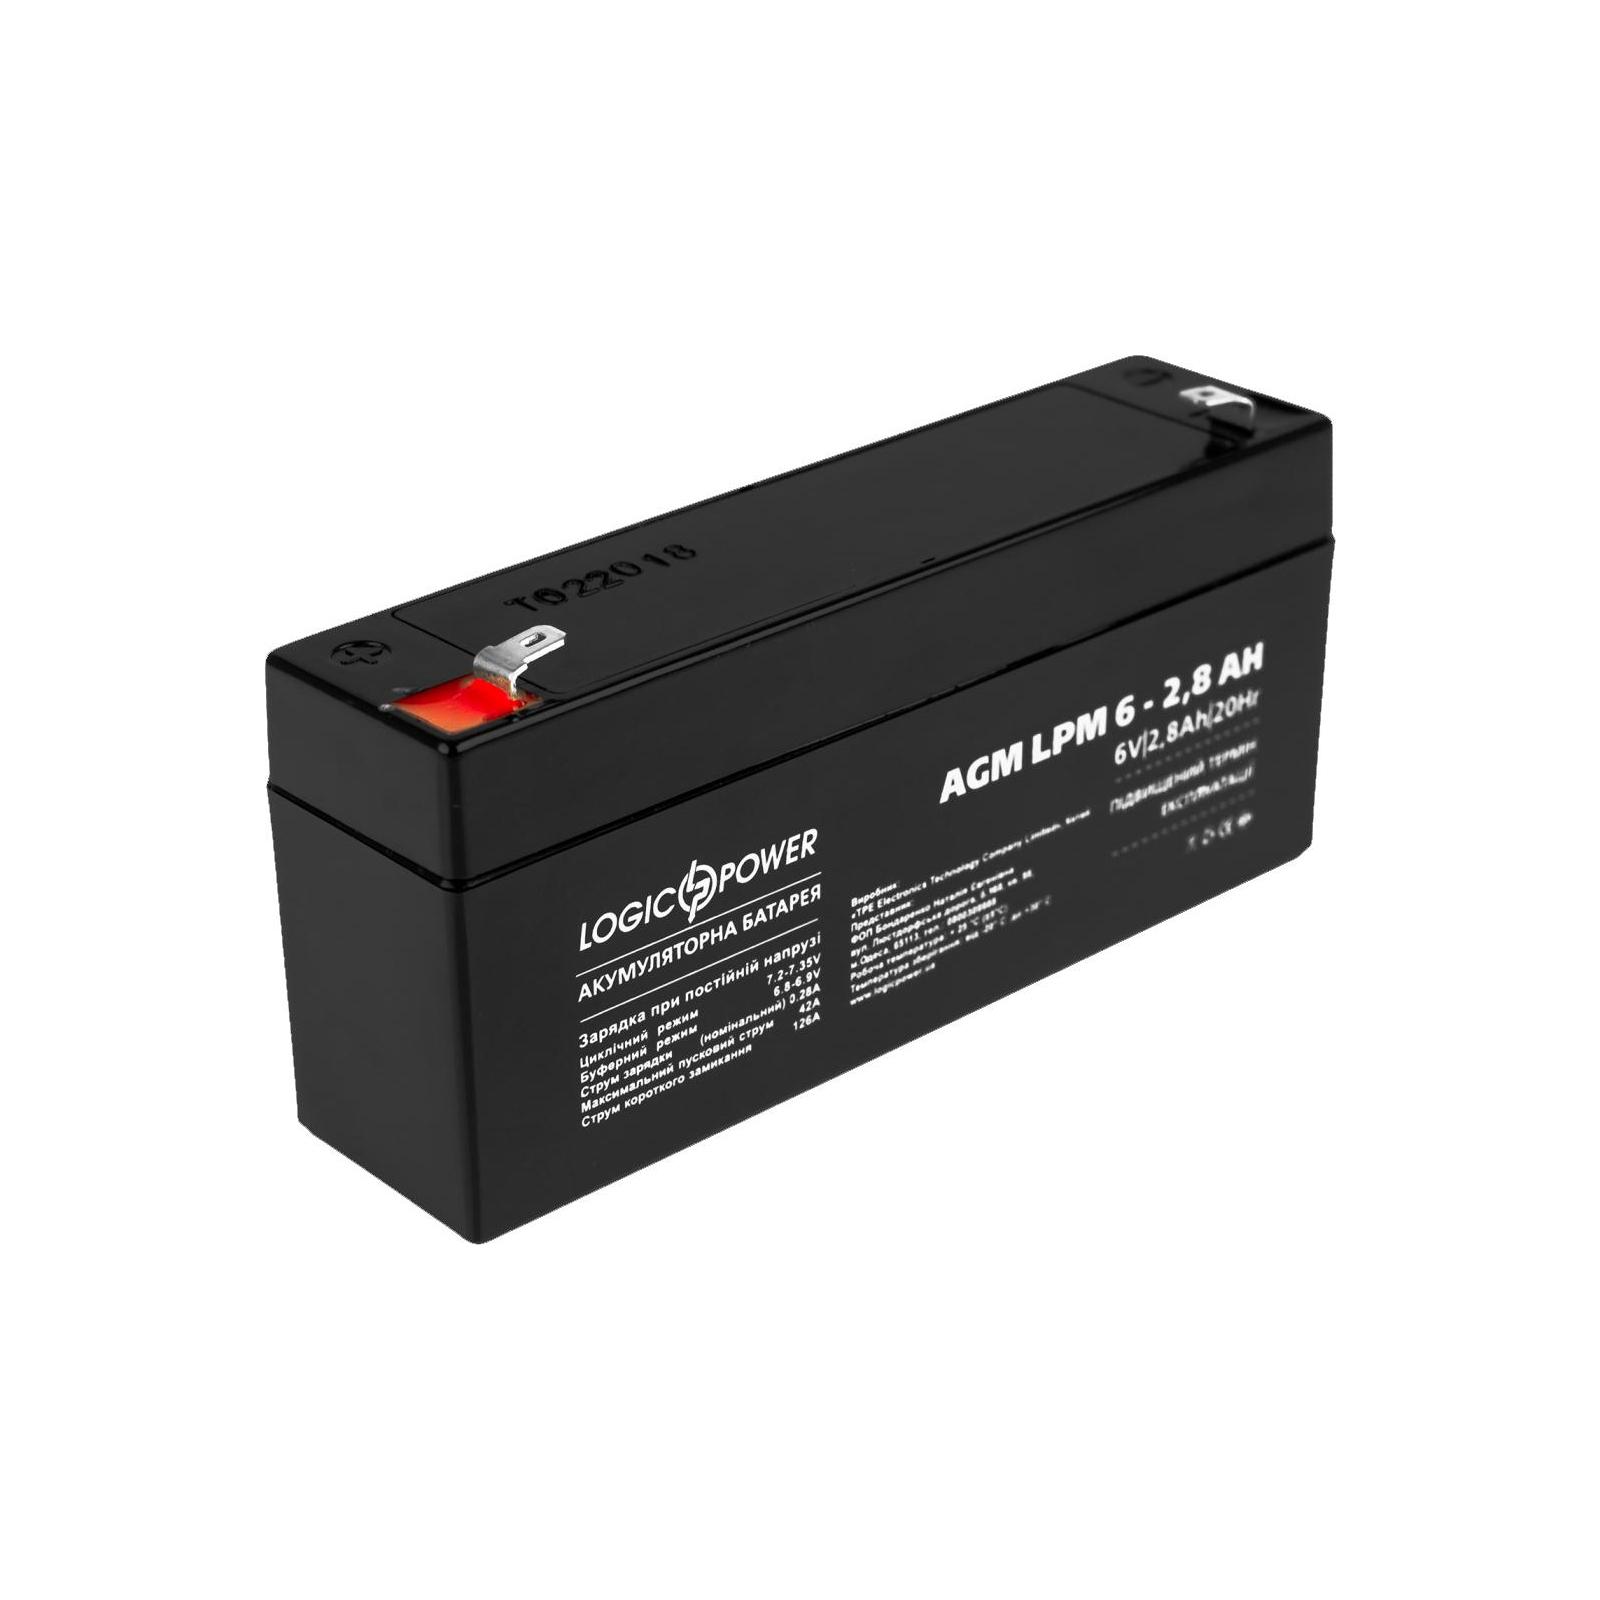 Батарея к ИБП LogicPower LPM 6В 2.8 Ач (4622) изображение 2